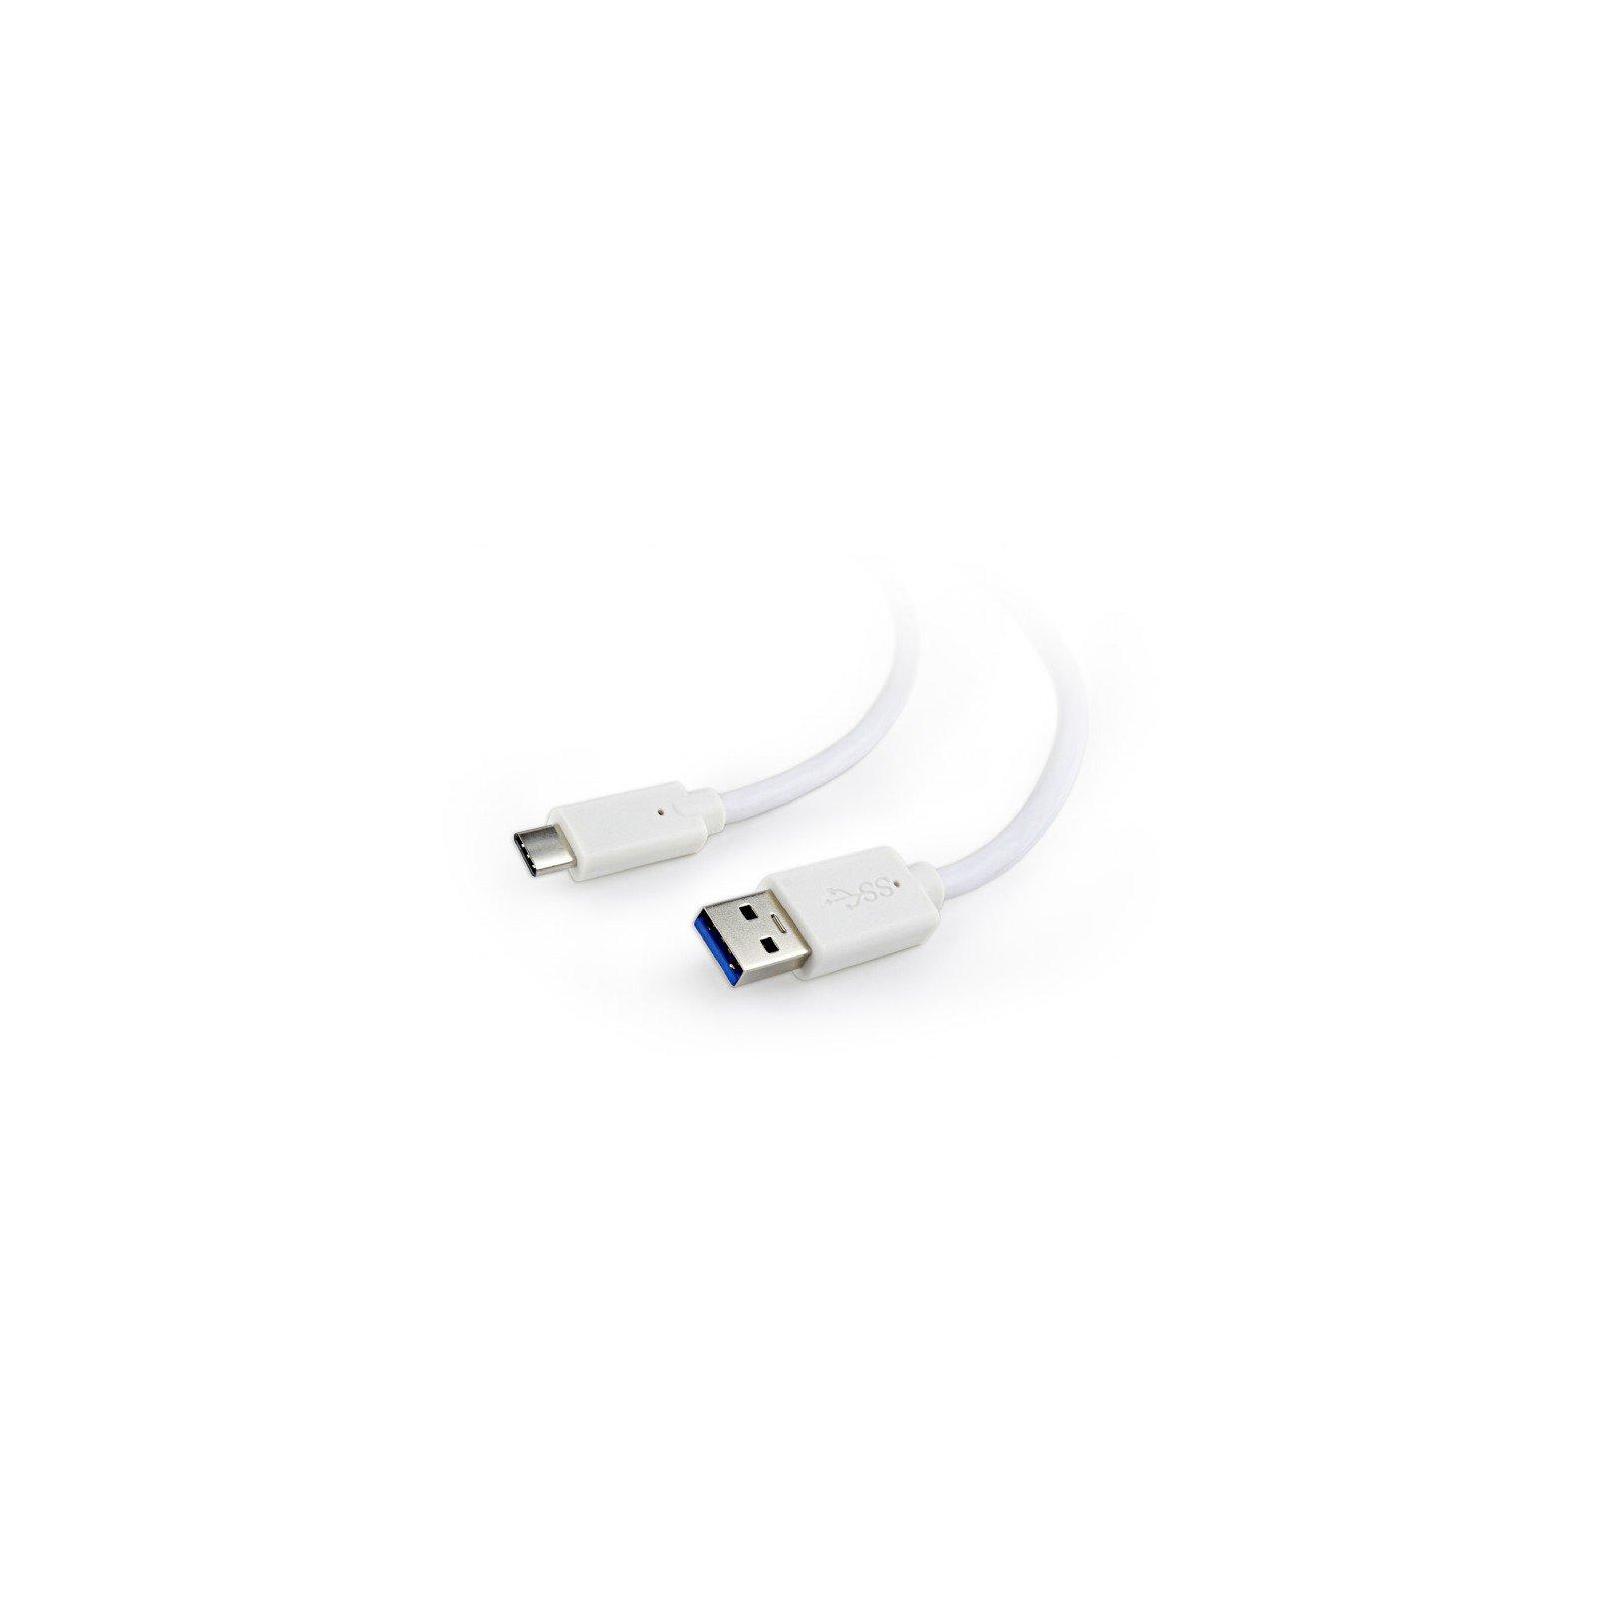 Дата кабель USB 3.0 AM to Type-C 1.0m Cablexpert (CCP-USB3-AMCM-1M-W)